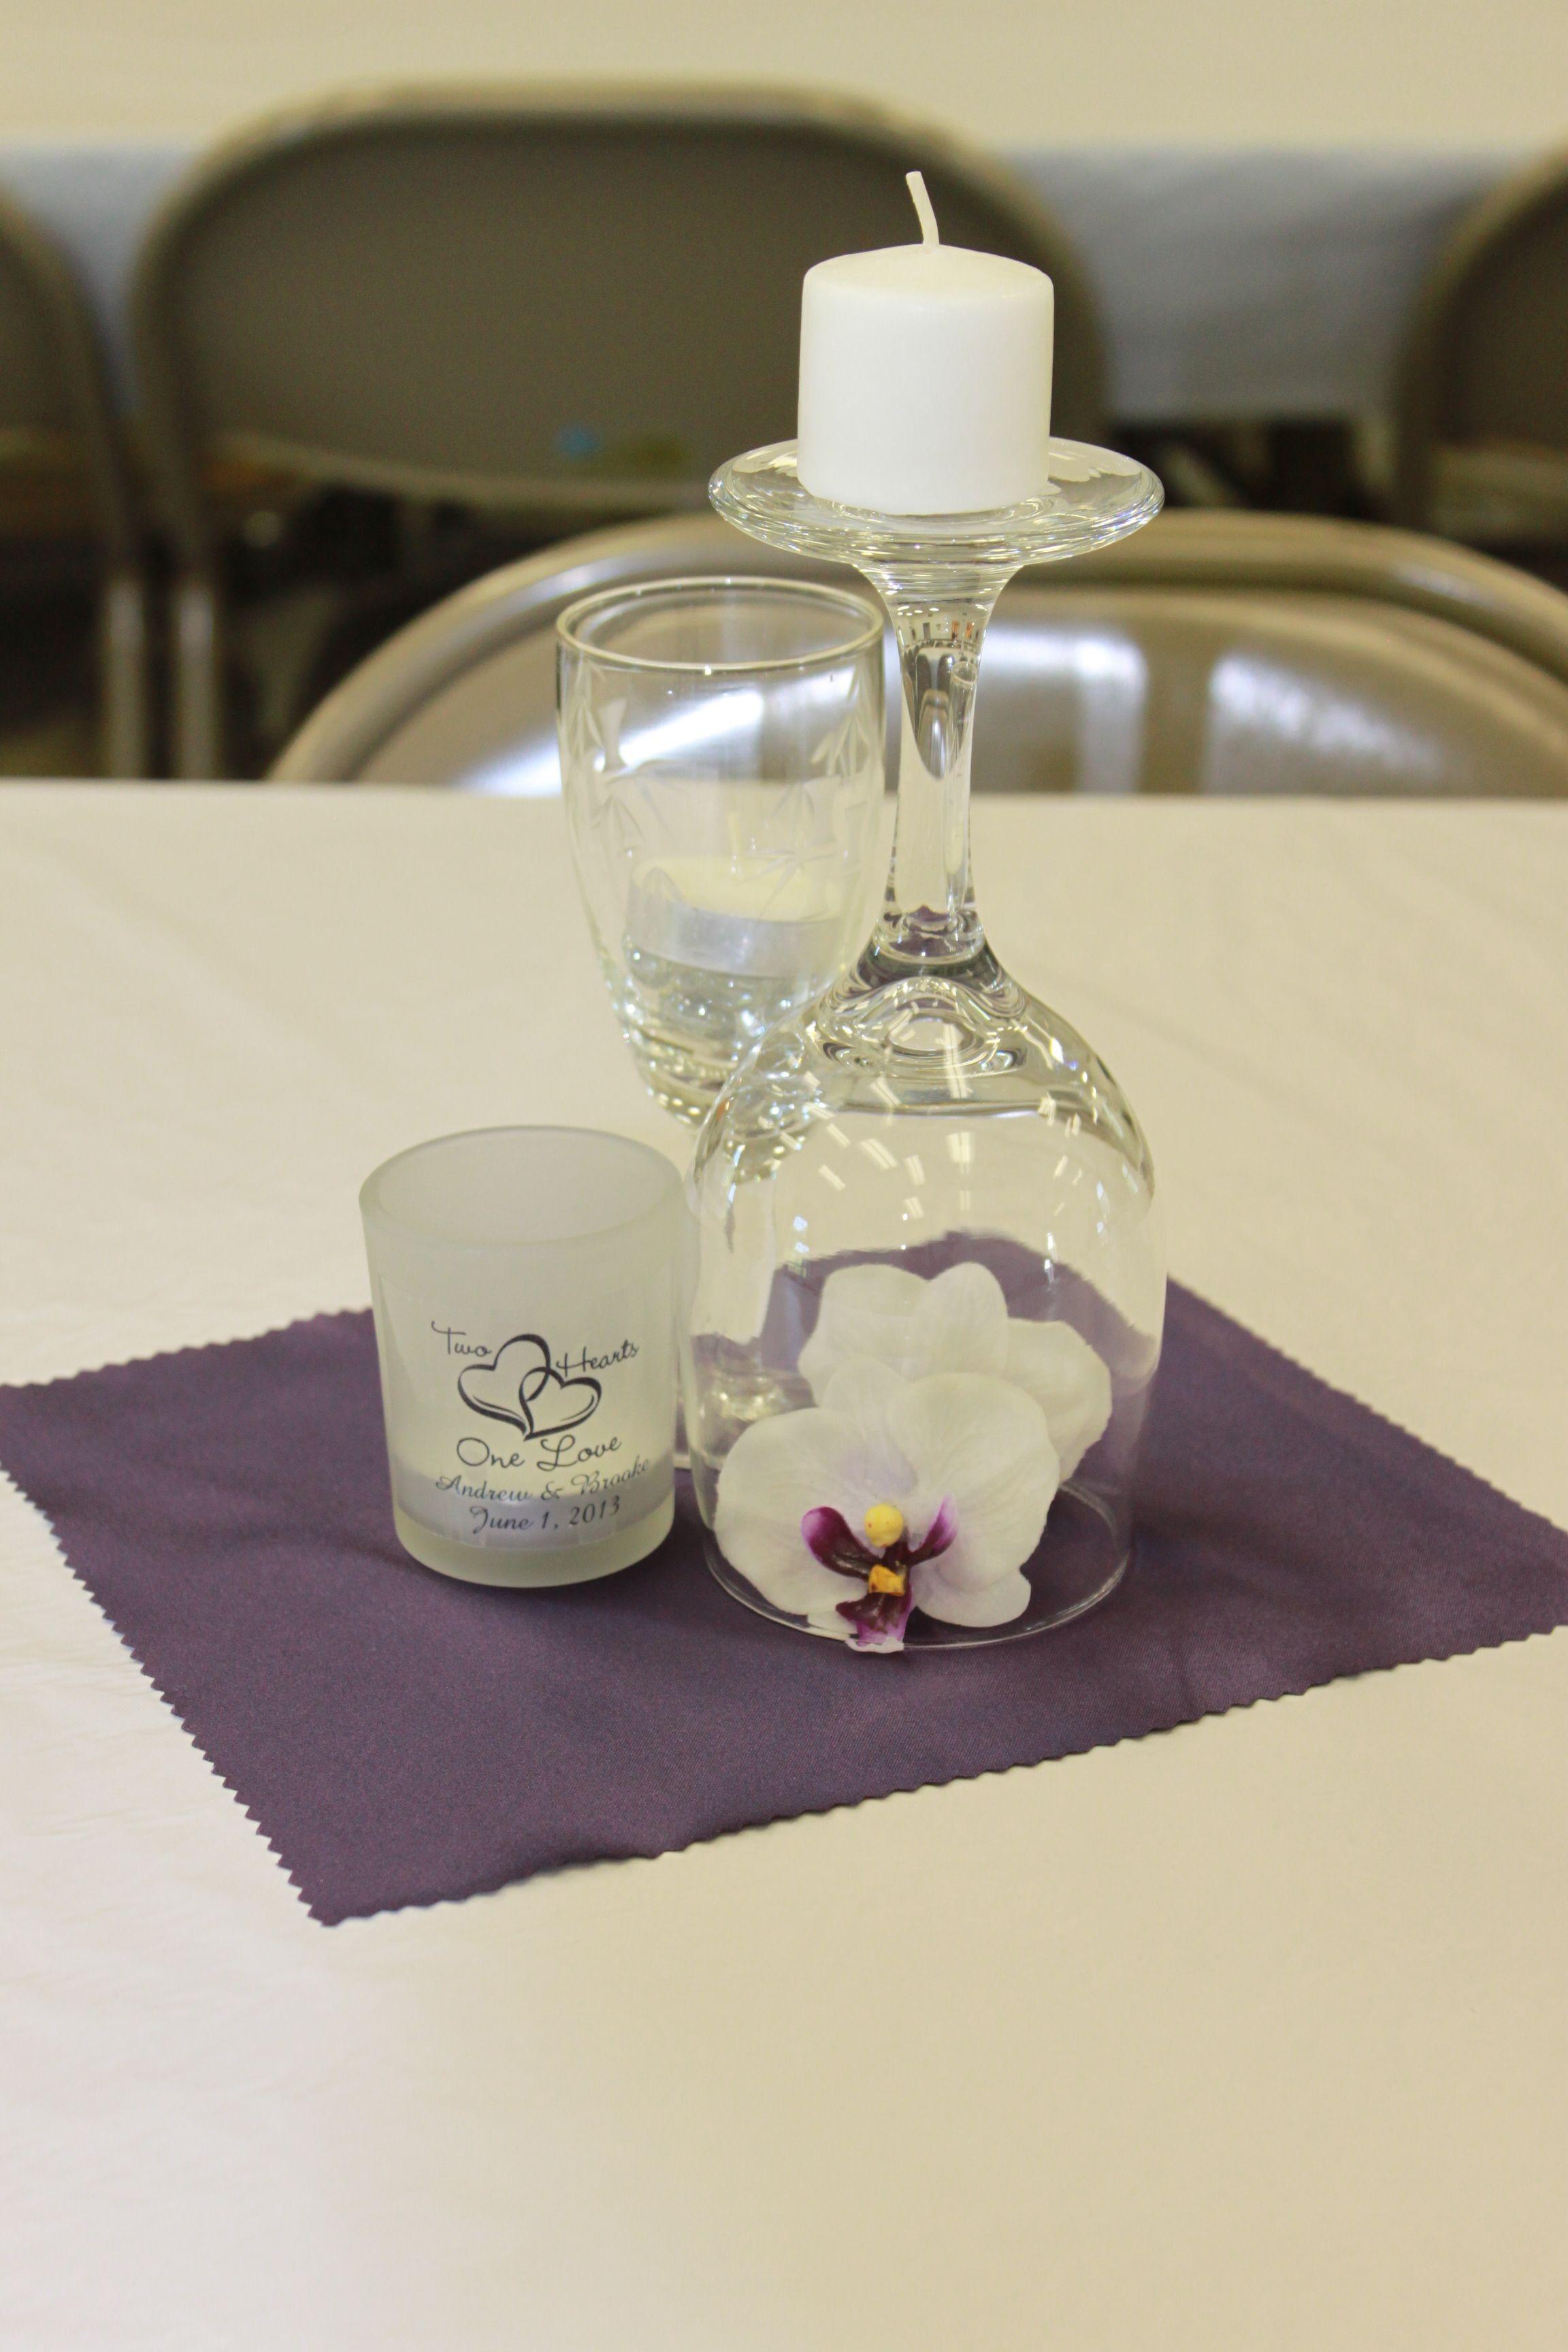 a centerpiece for a wedding...I got the upside down wine glass idea ...